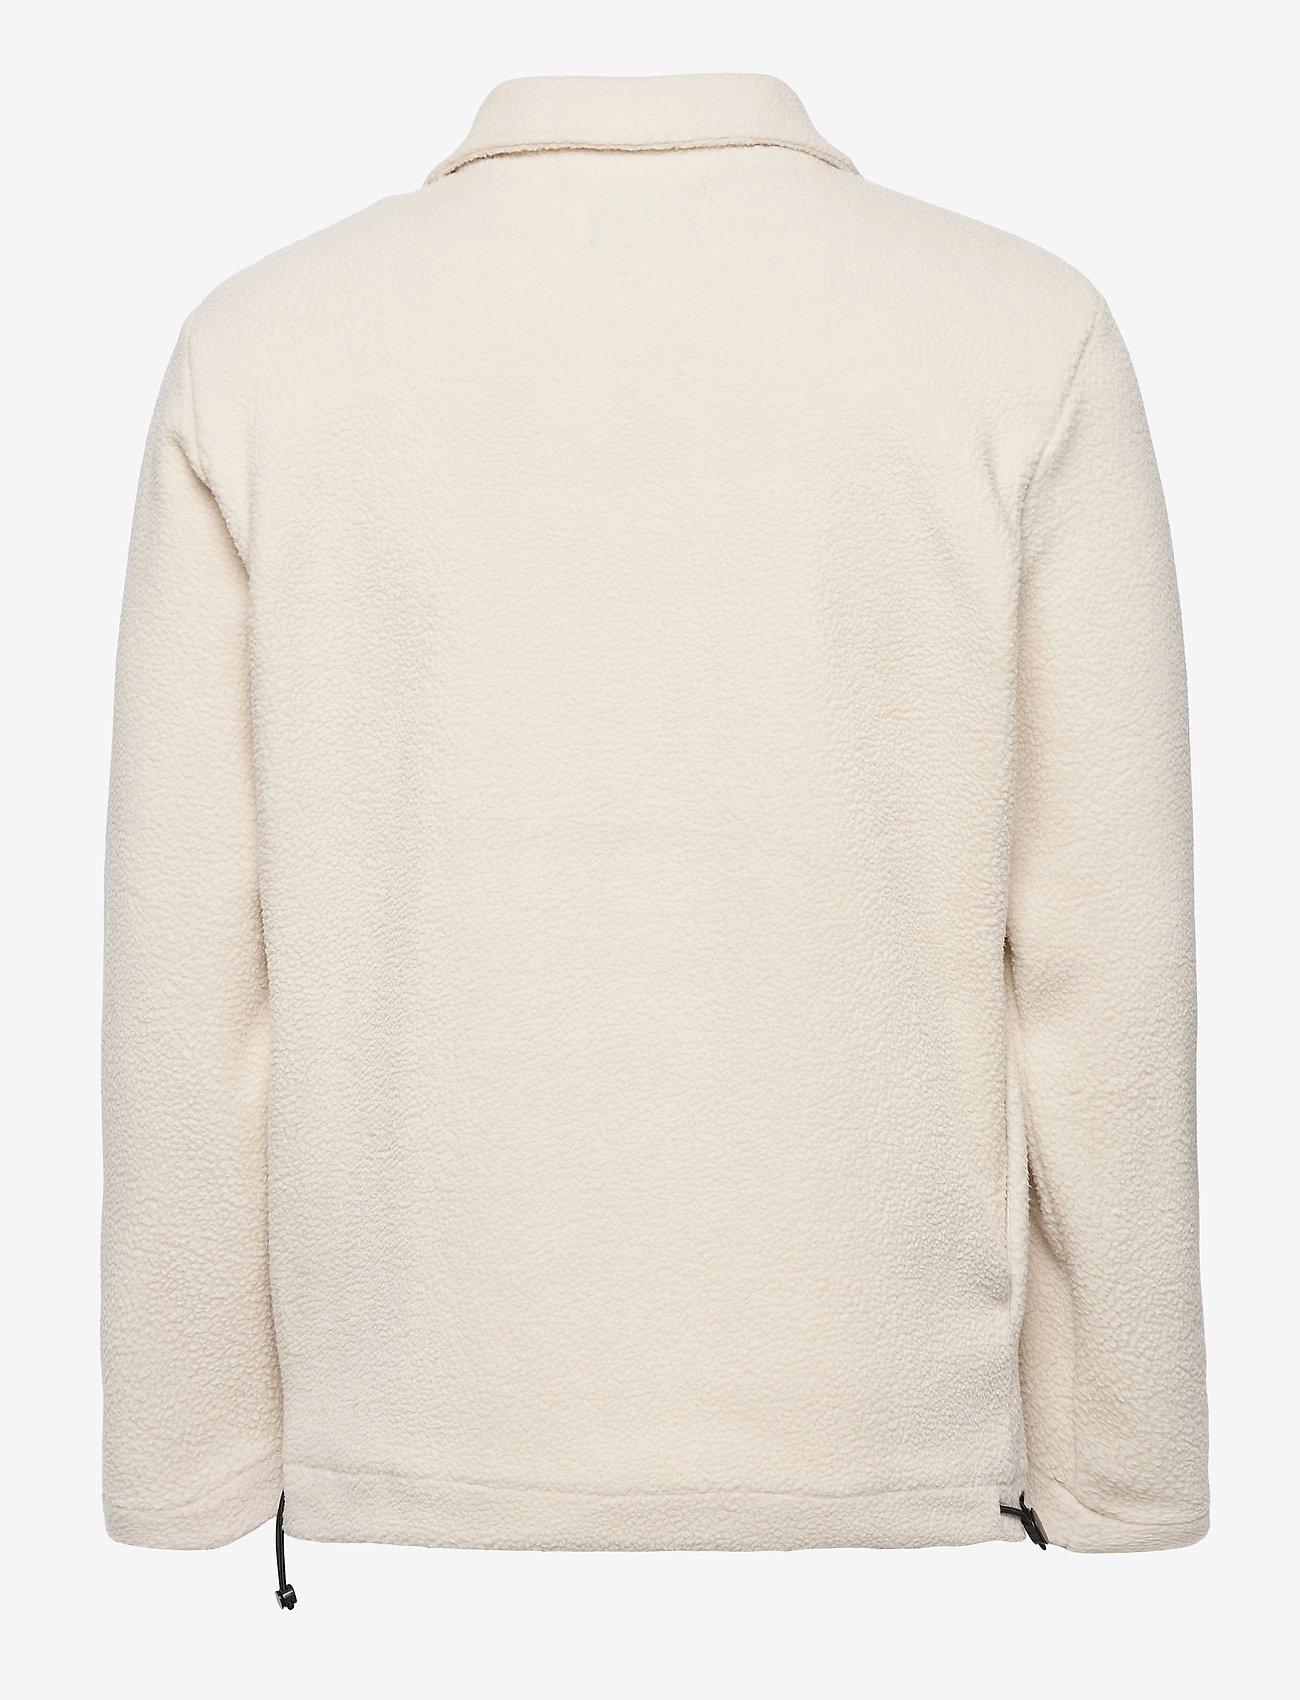 Les Deux - Dallas Fleece Rugby Sweatshirt - basic-sweatshirts - off white - 1